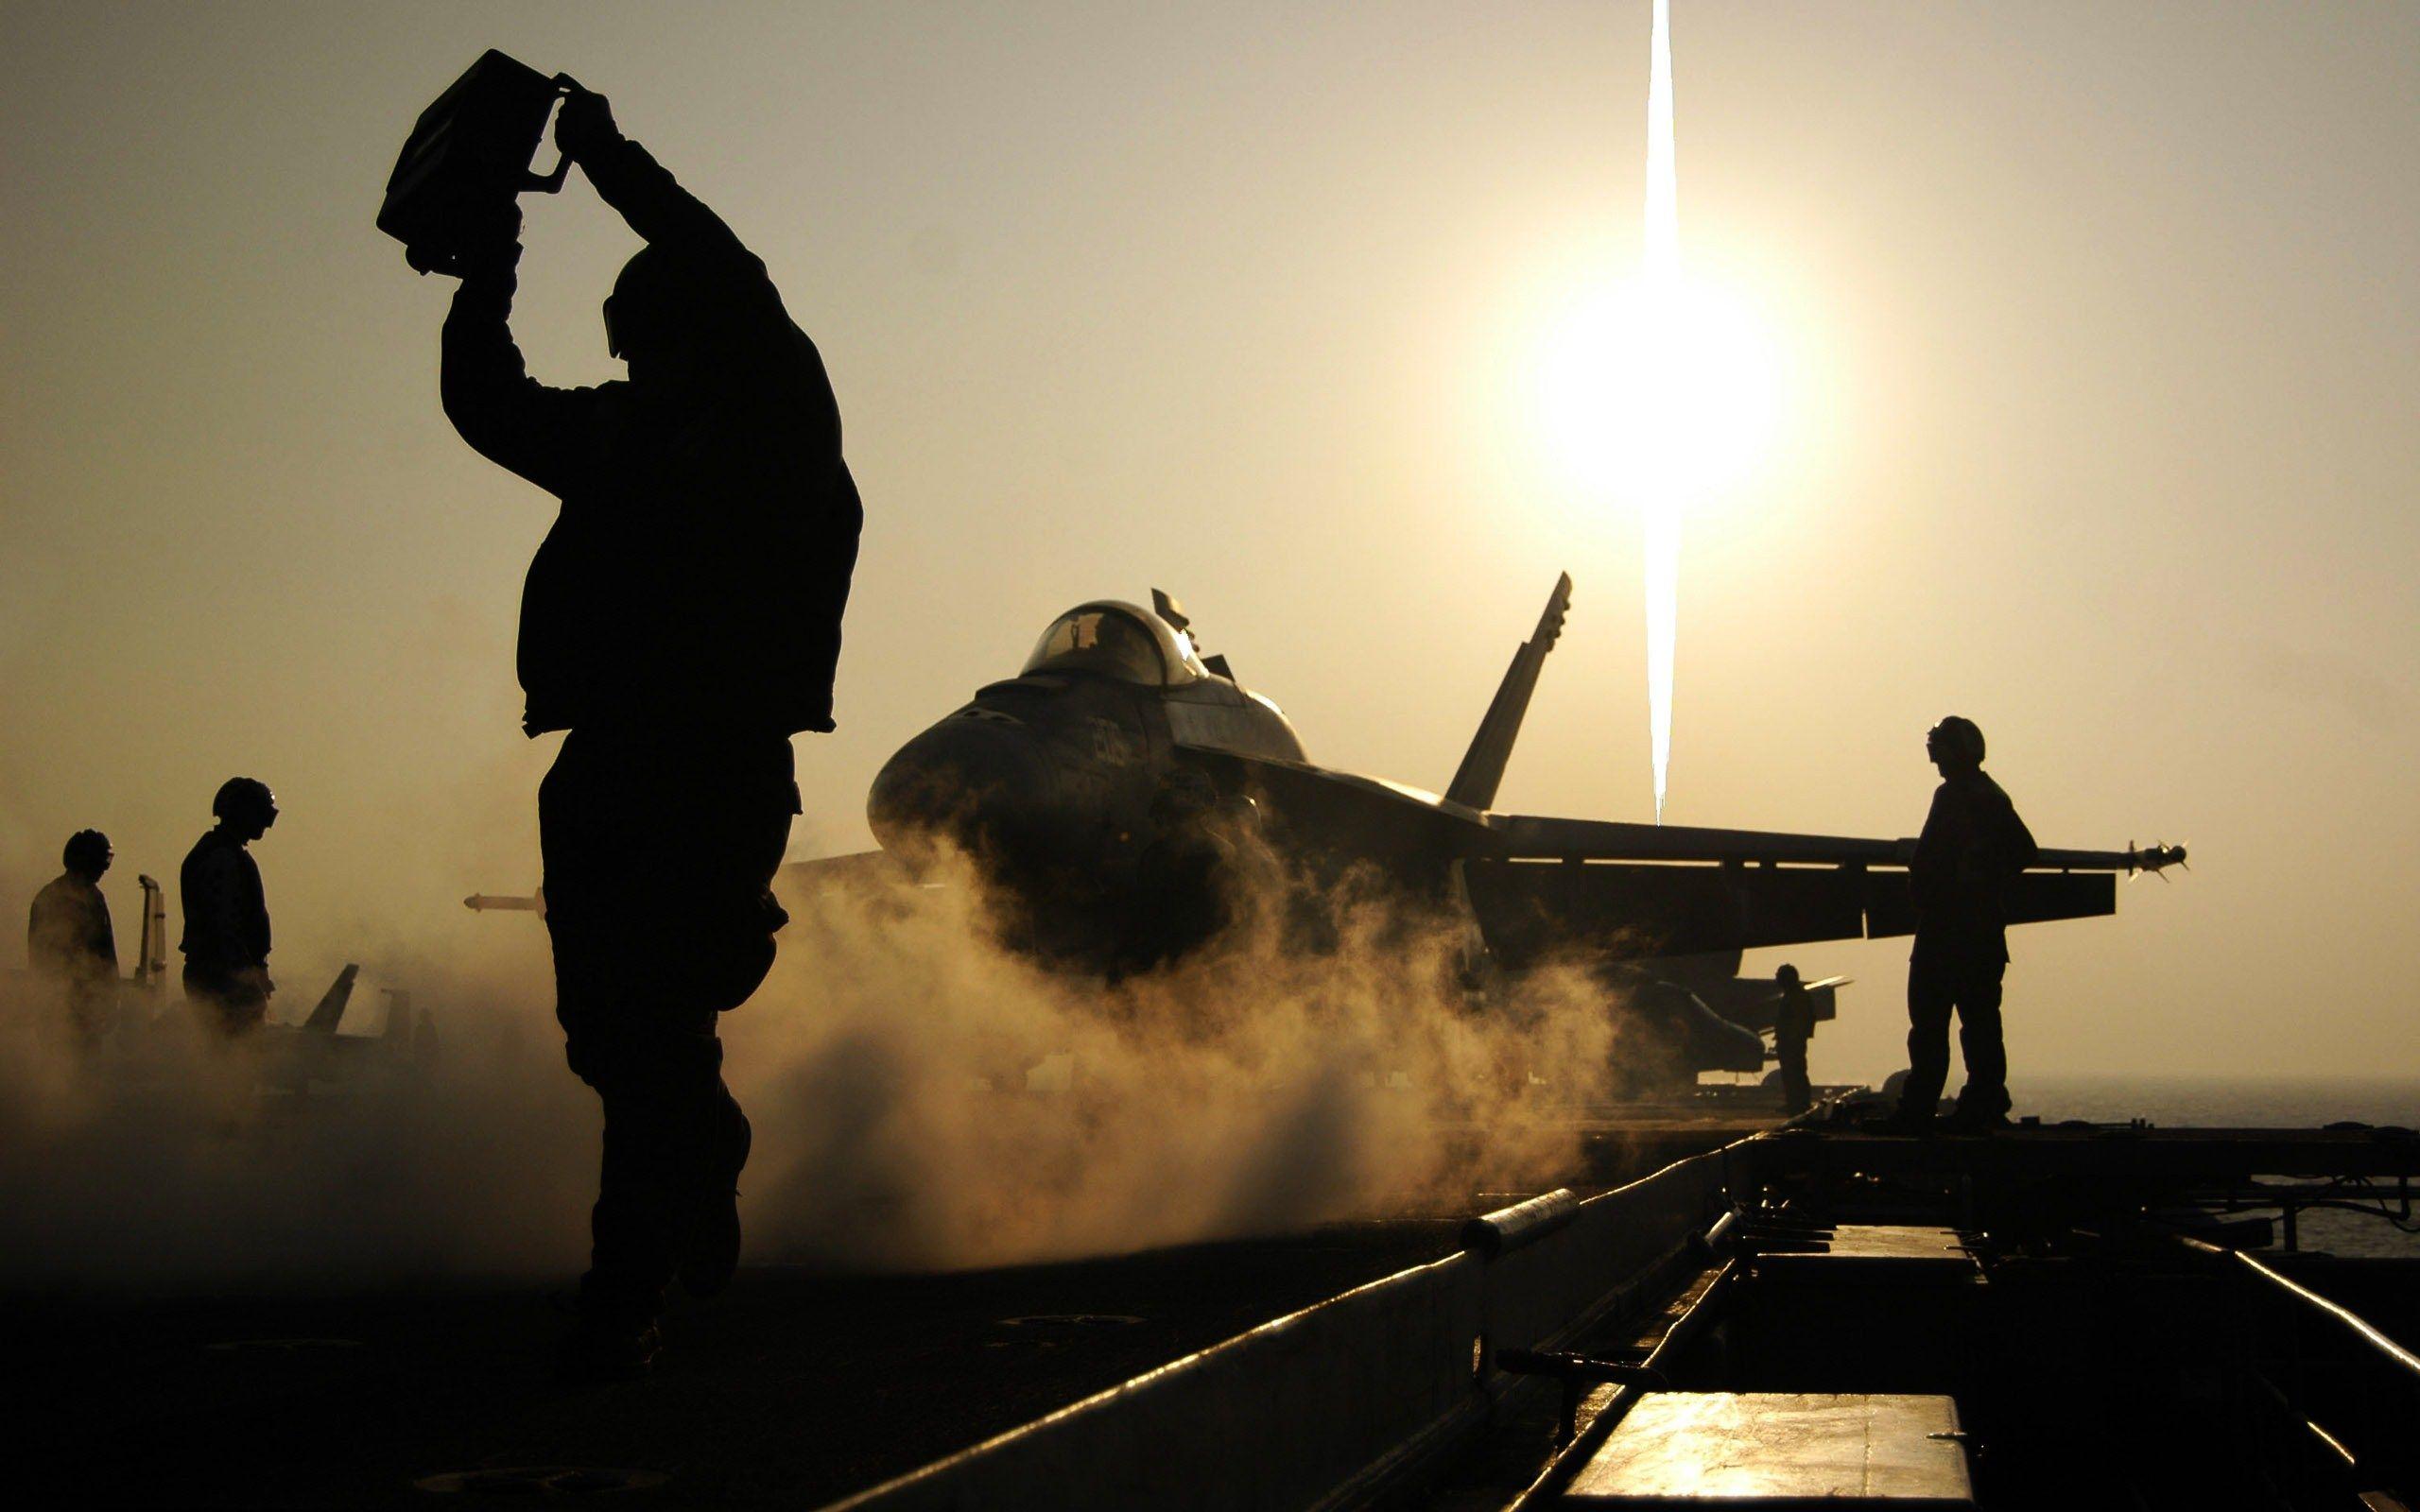 aircraft carrier takeoff hands on deck wide hd wallpaper